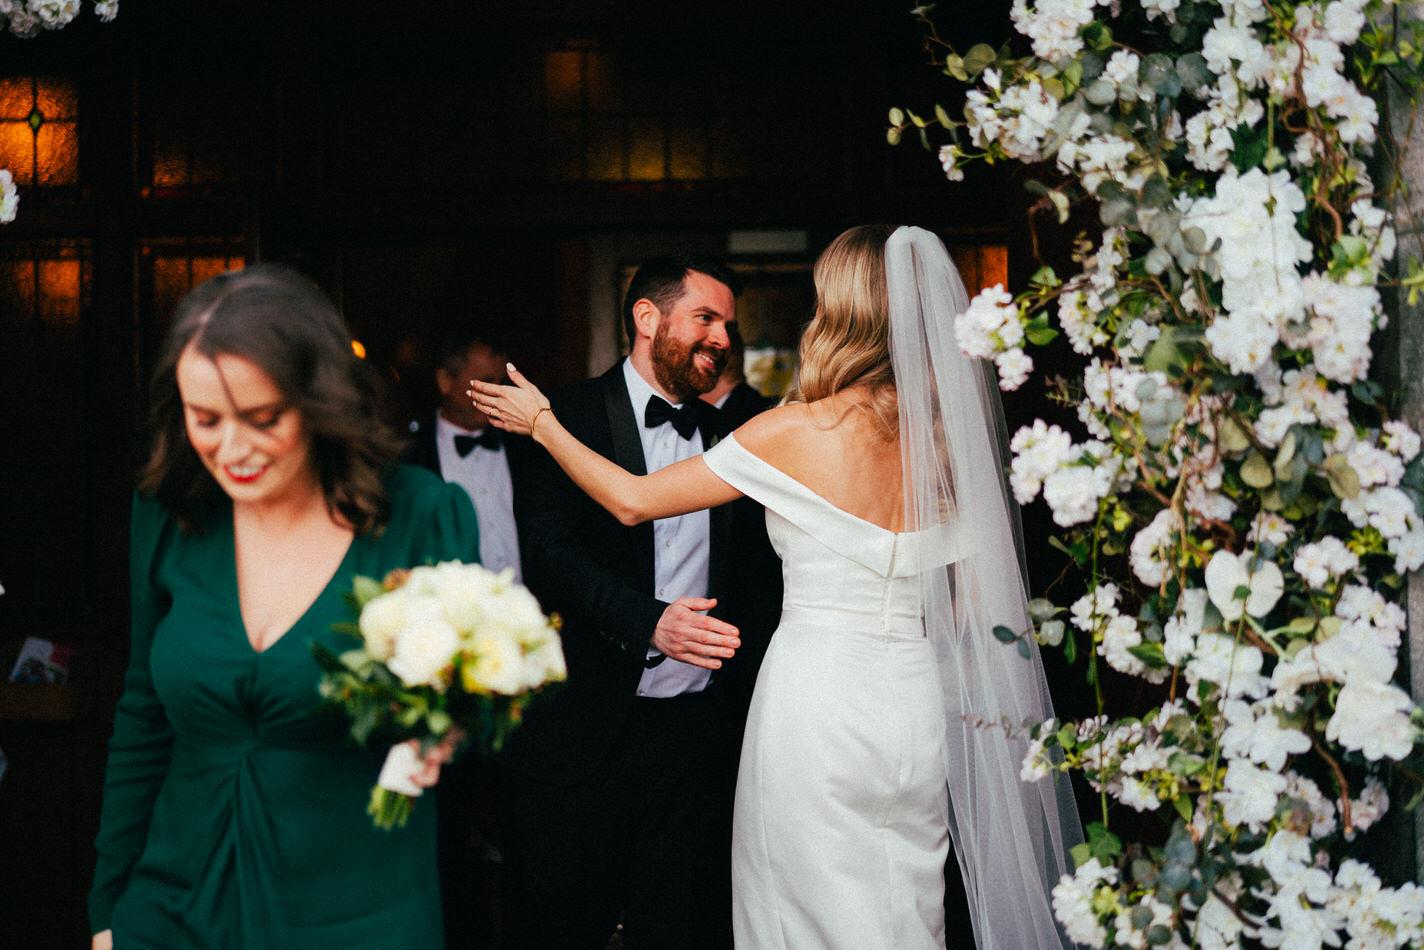 Castle-wedding-ireland-photos- 0154 106